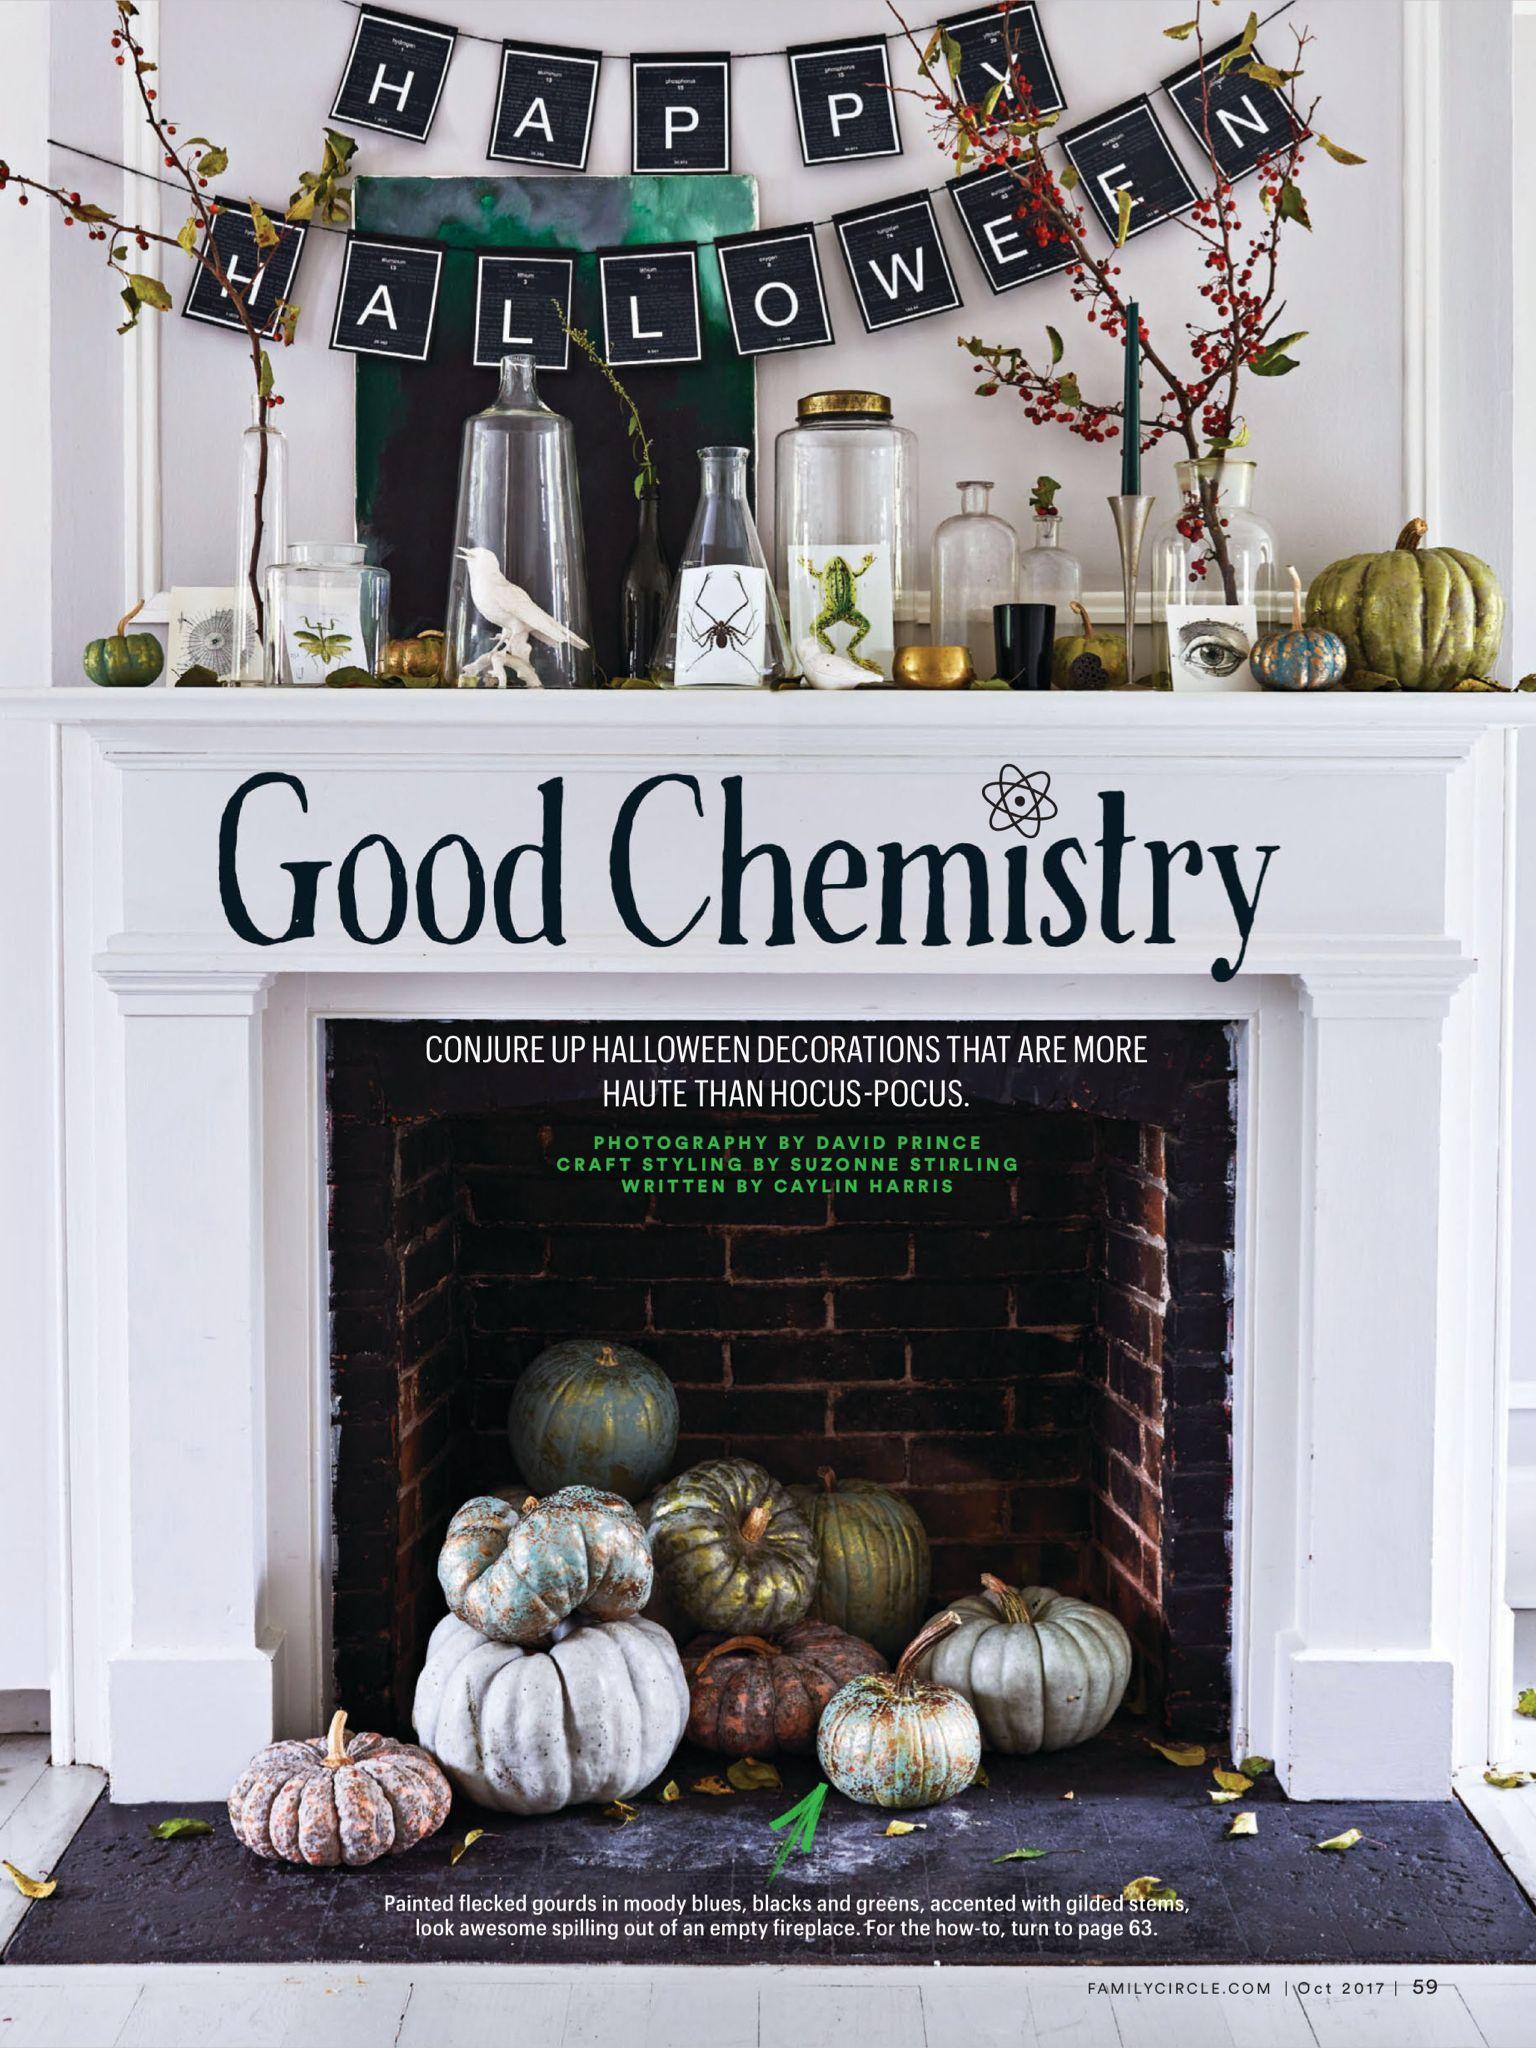 e0a0166aa1f890b079a3326544f448c0 - Better Homes And Gardens Halloween Tricks And Treats Magazine 2017